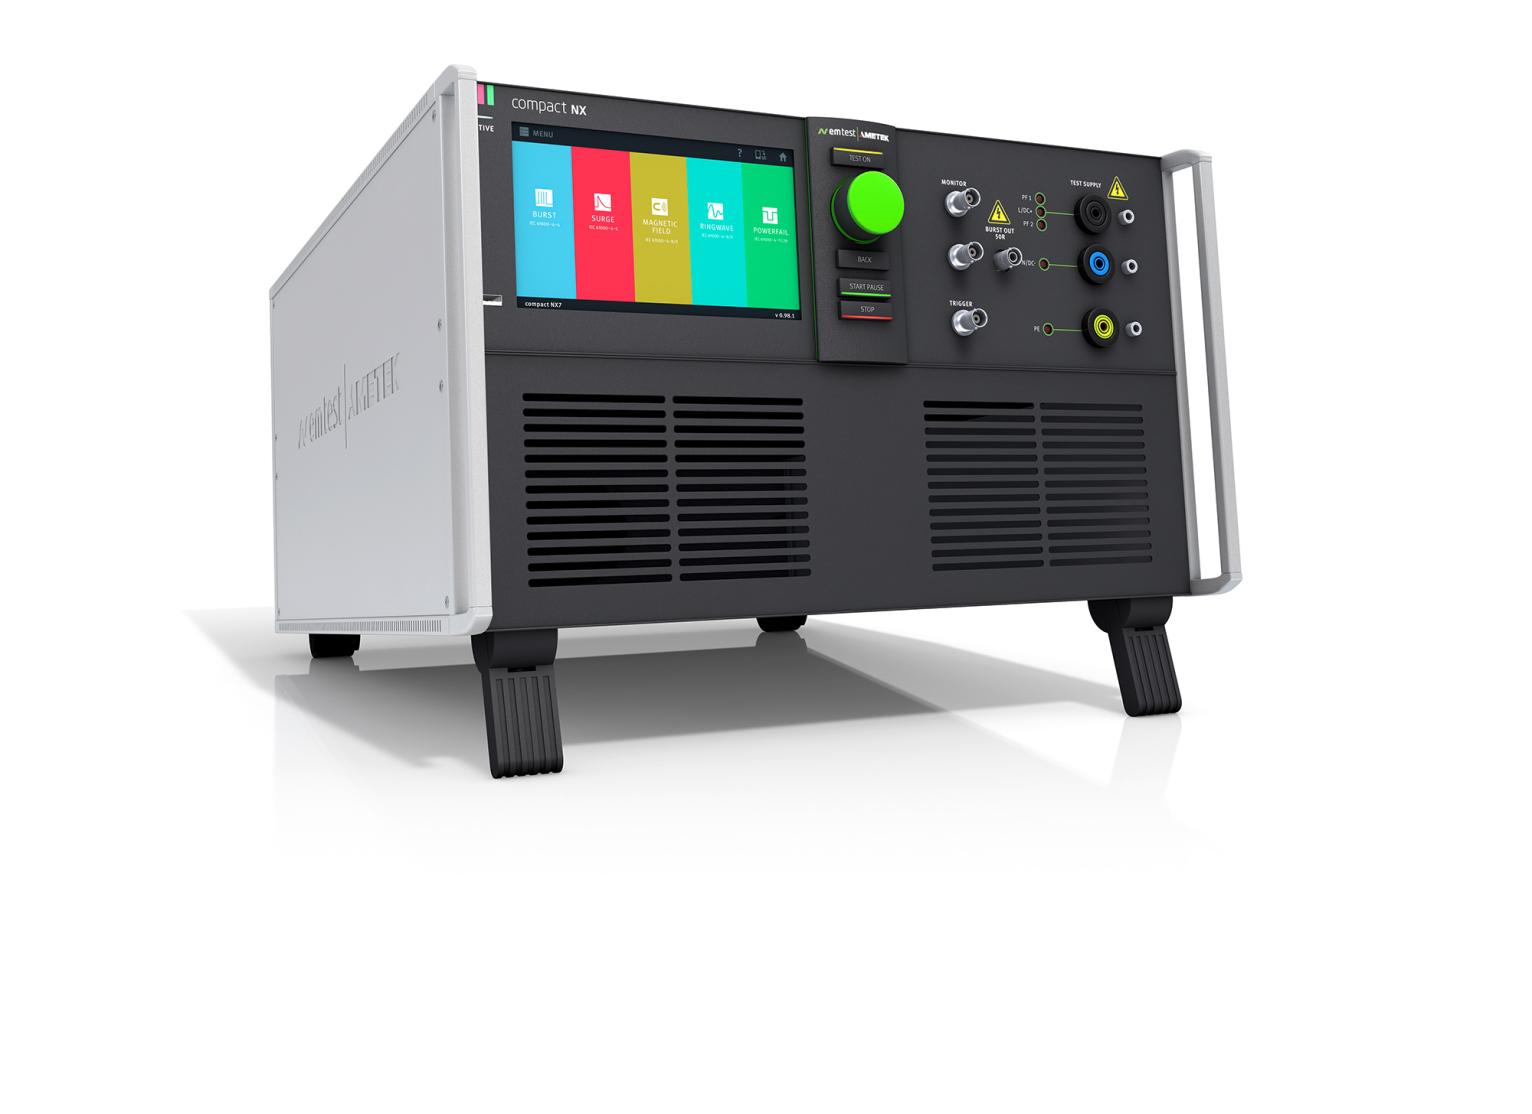 Transient Immunity Generators Eft Burst Surge Ringwave Atec Lcd Projector Multifunction Controller Circuit Diagram Control Em Test Nx7 Multifunctional Generator